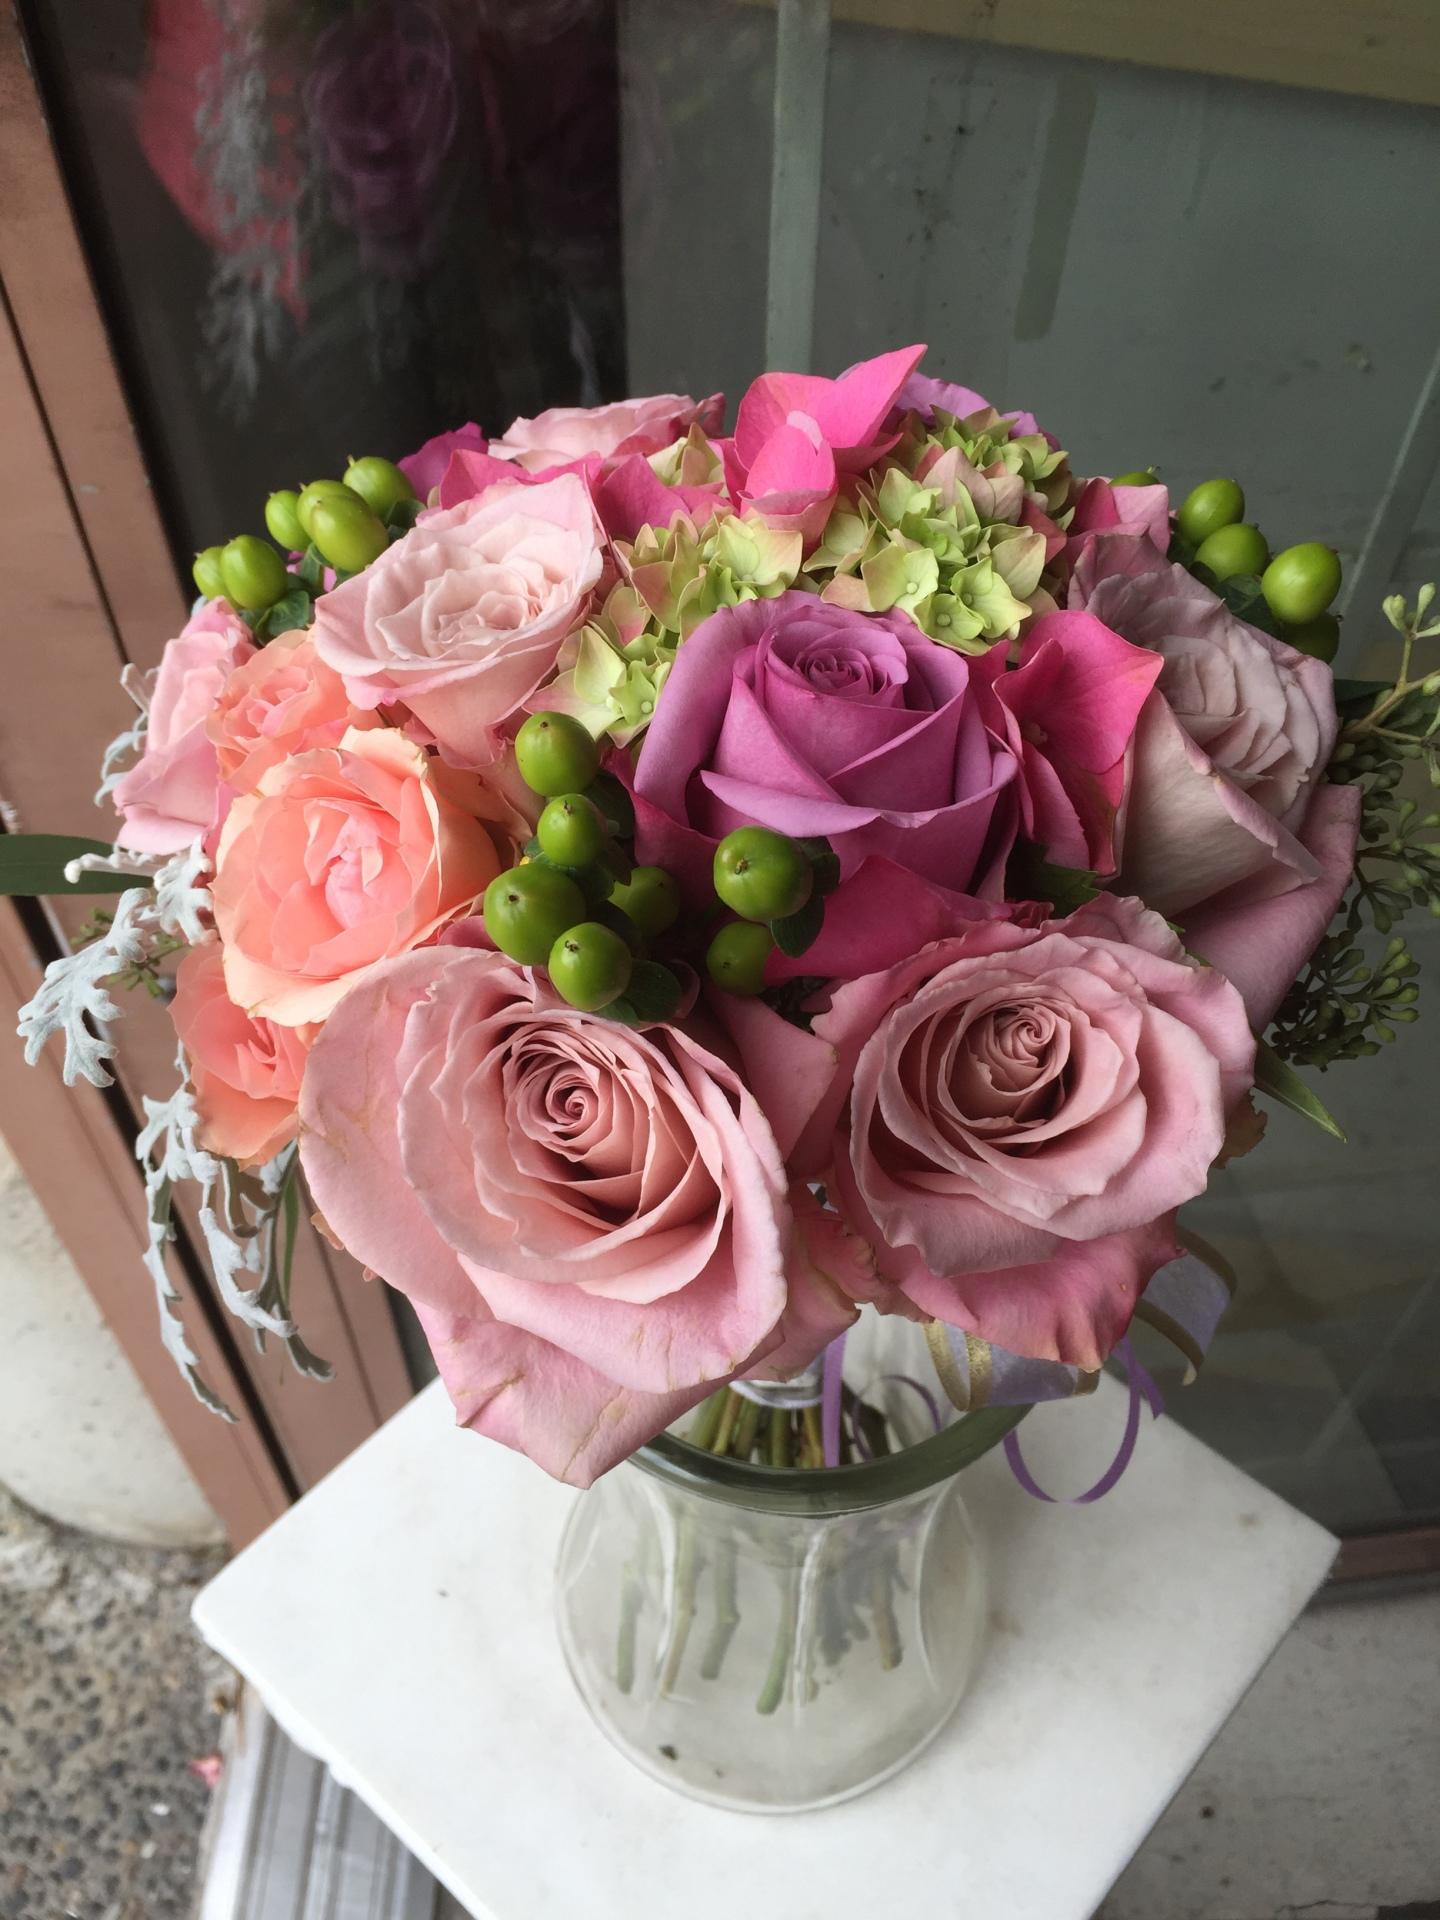 Deep Emotions Rose Bouquet